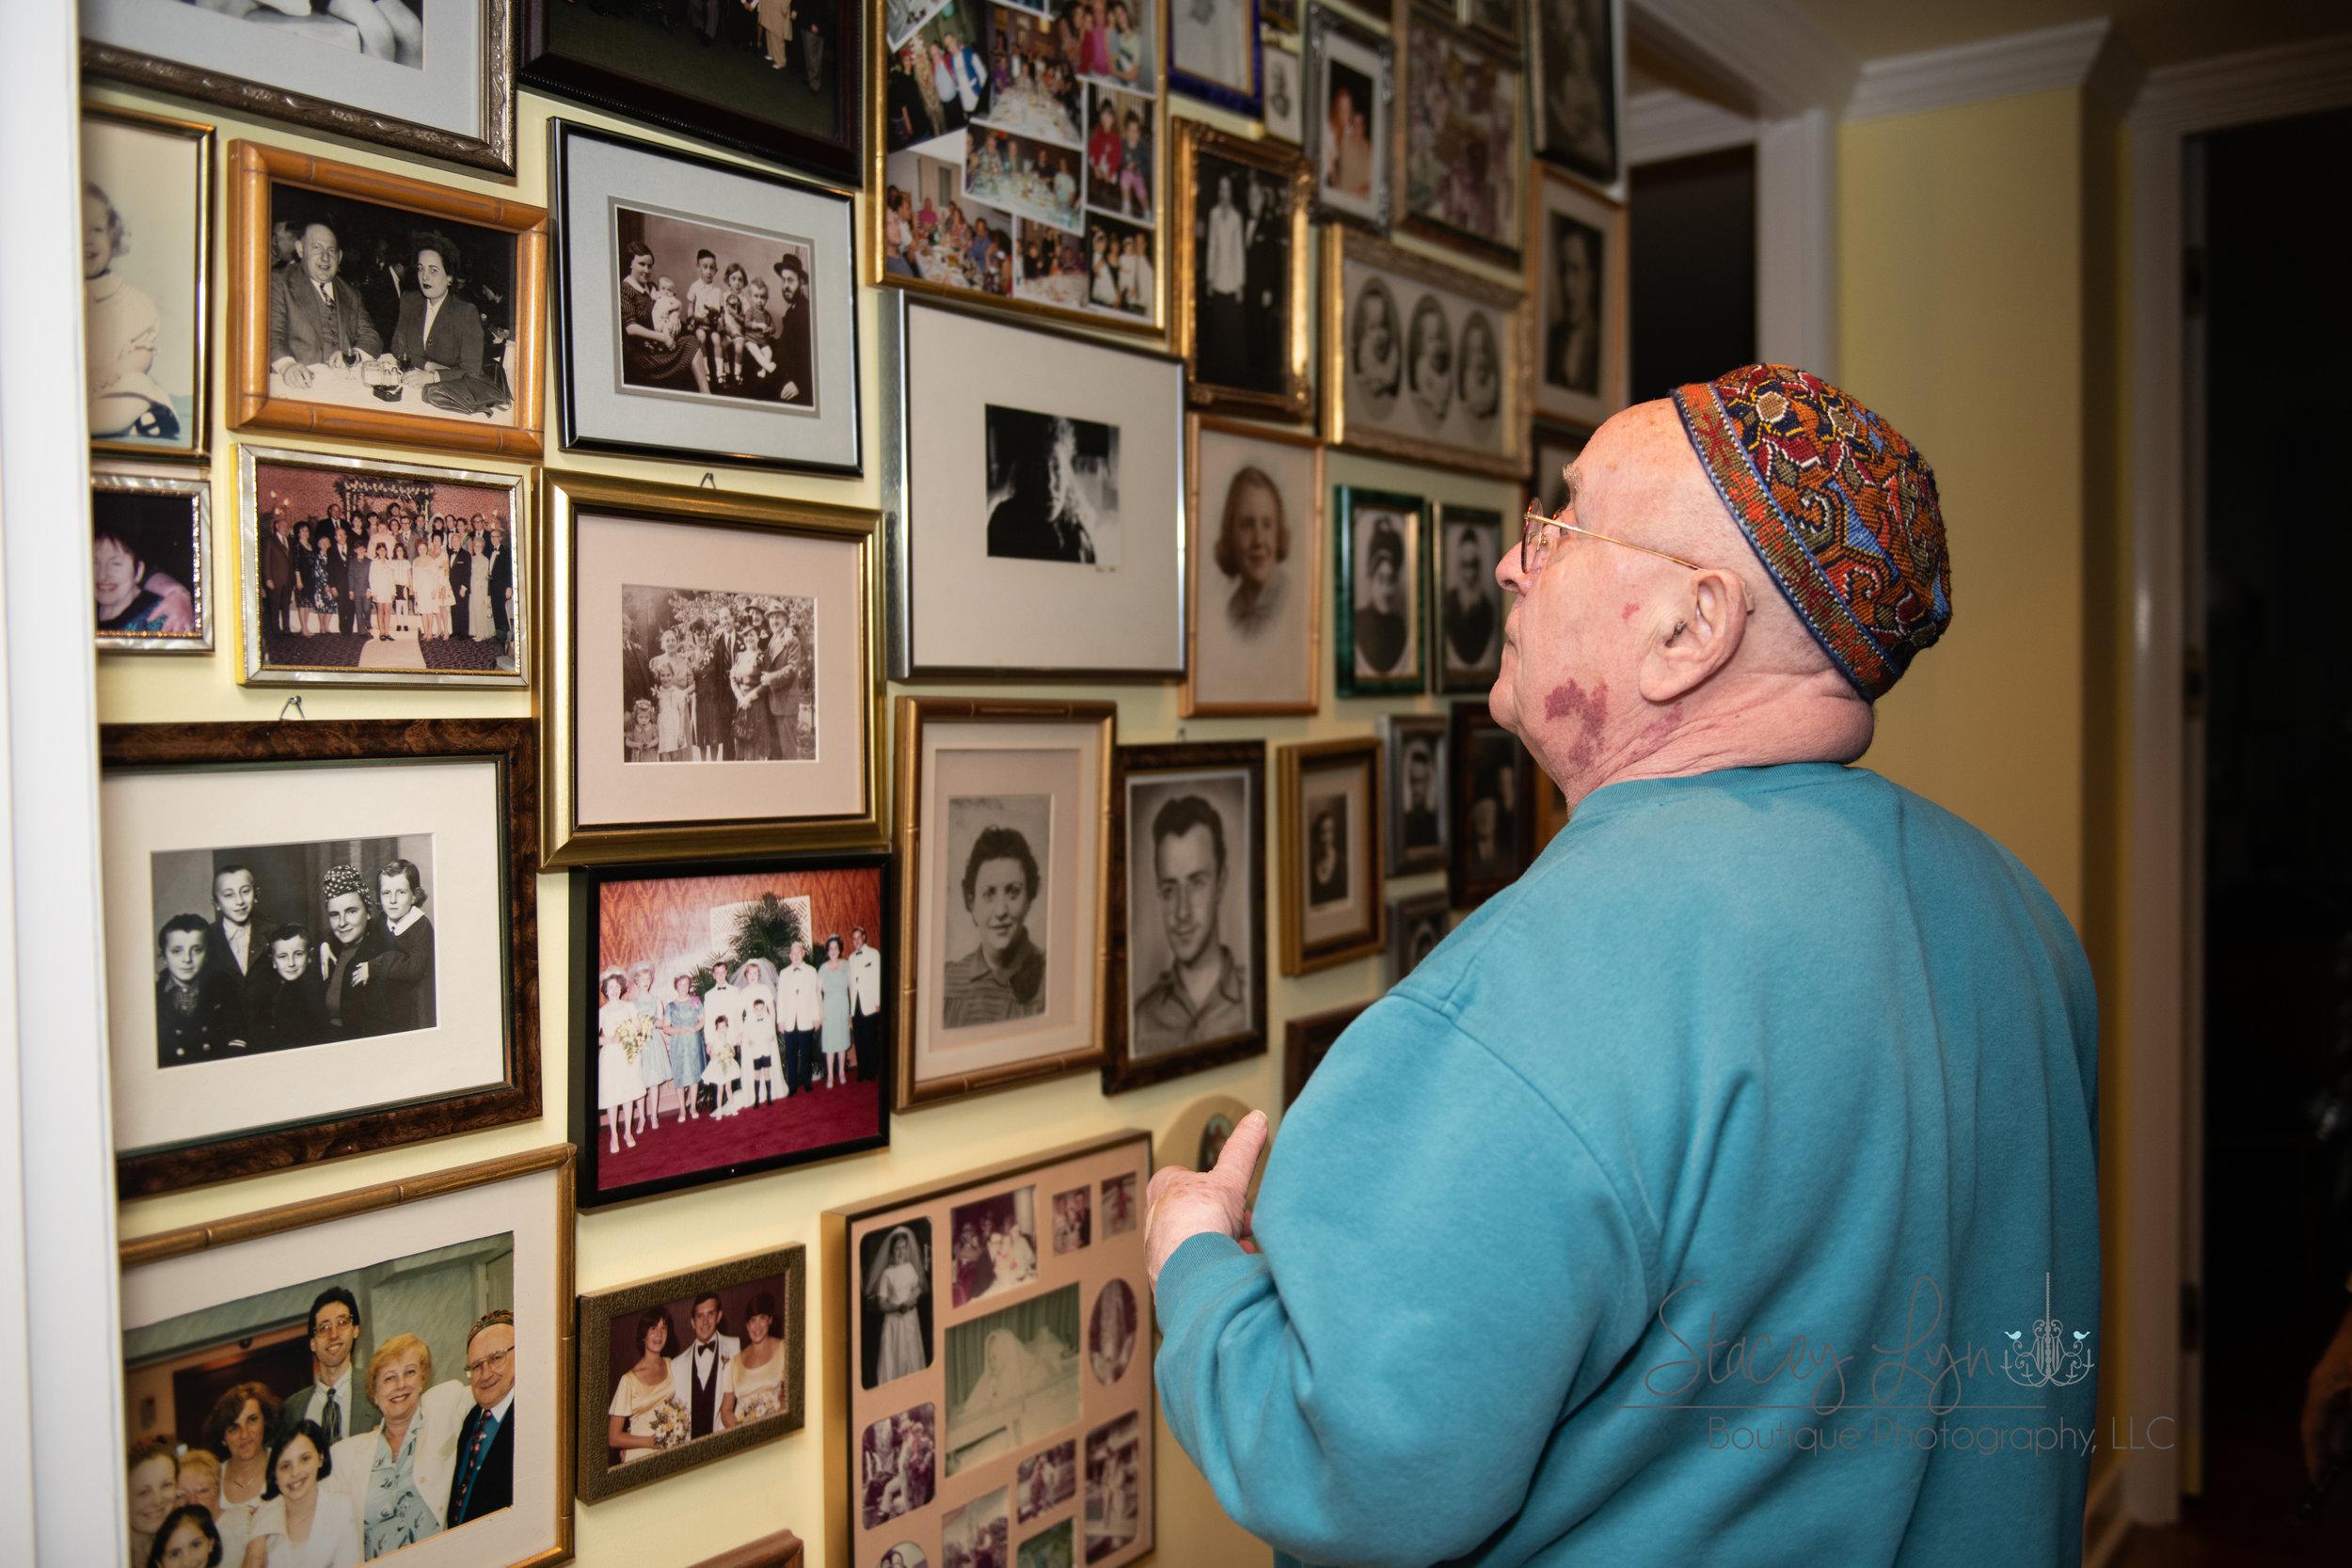 Mr. Judah Samet looking at his wall of family memories